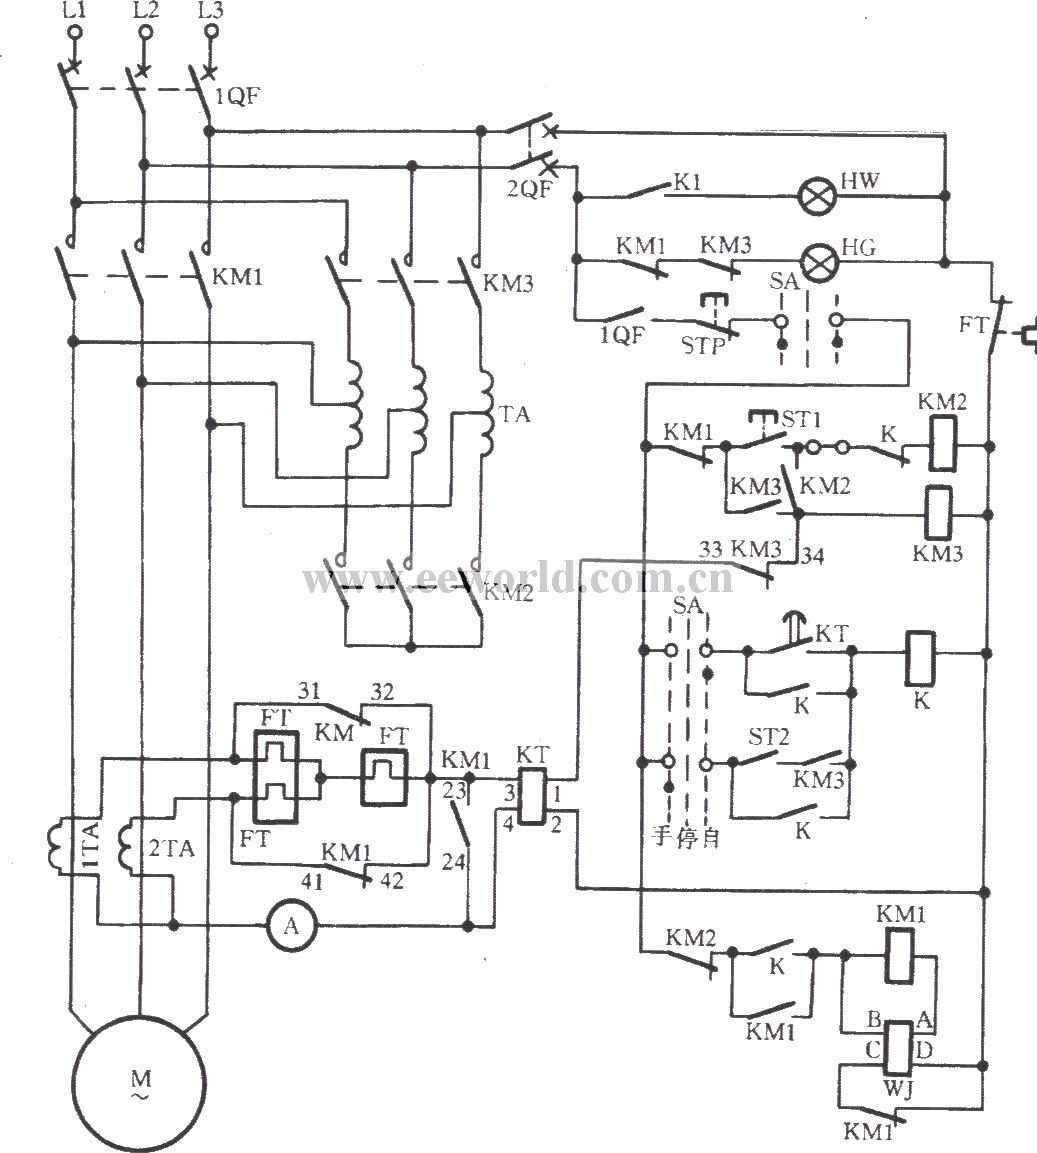 Jk1 125 Auto Buck Starter Circuit